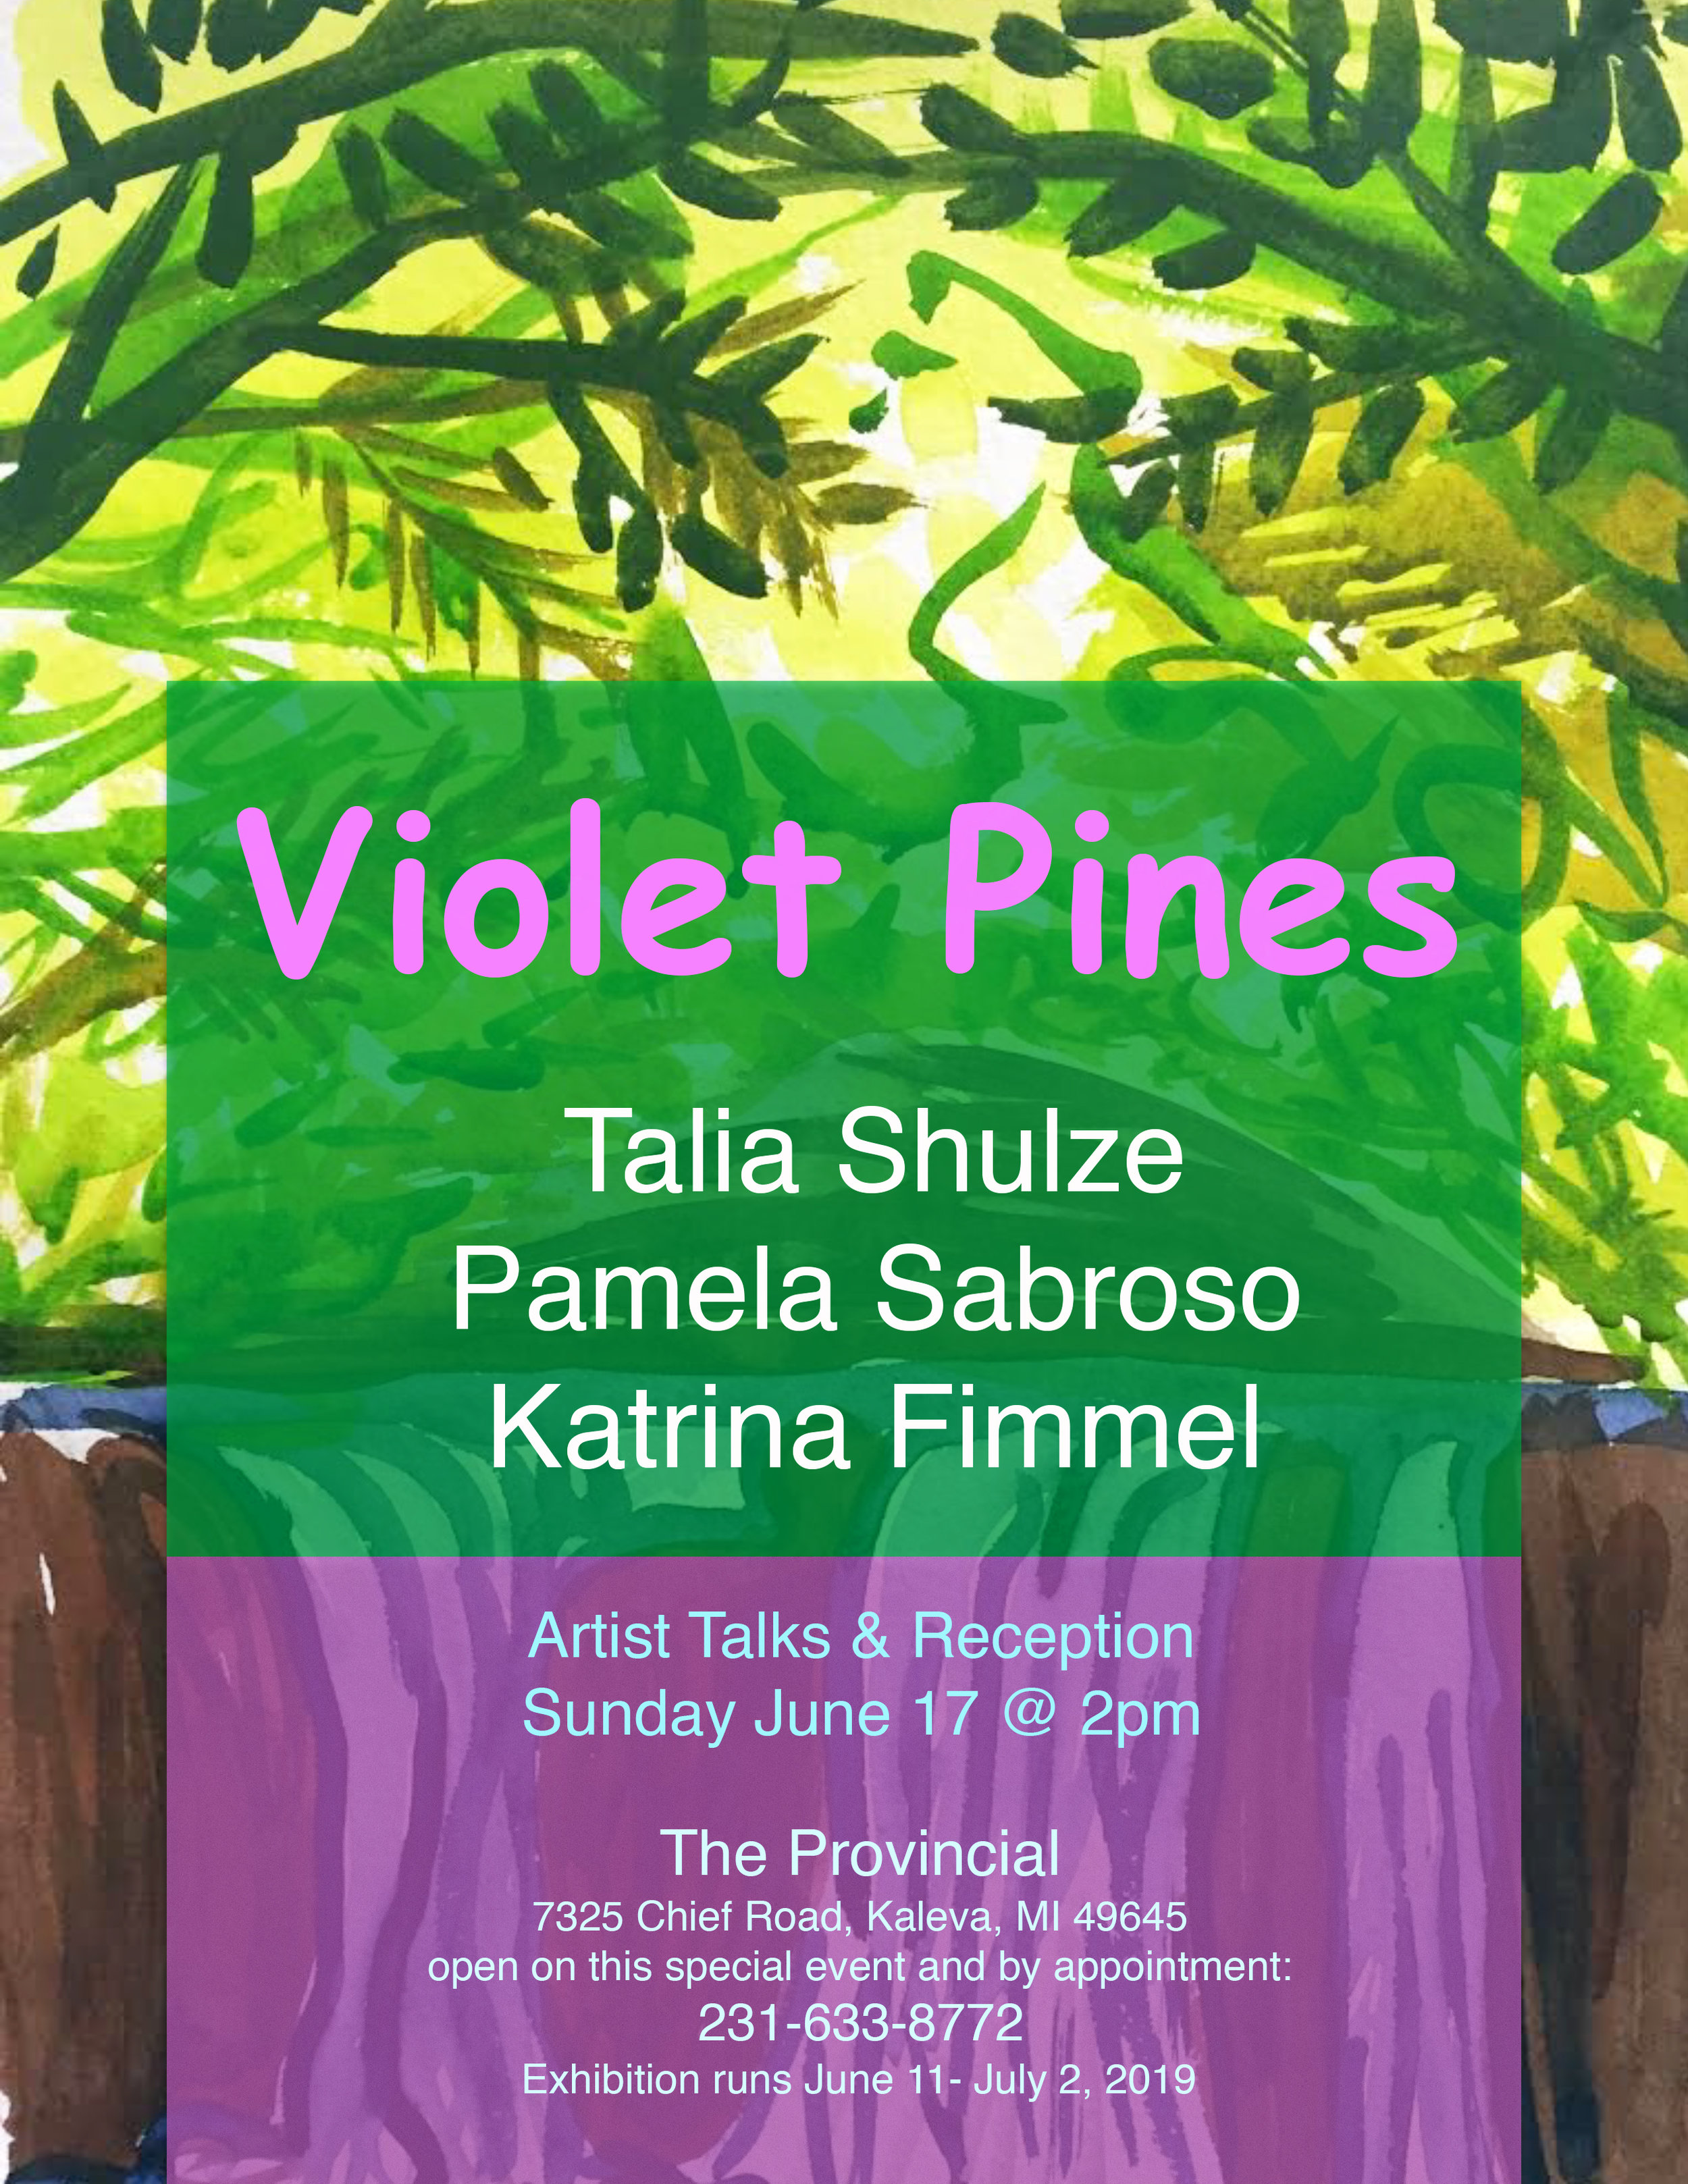 Violet Pines Poster 2018.jpg